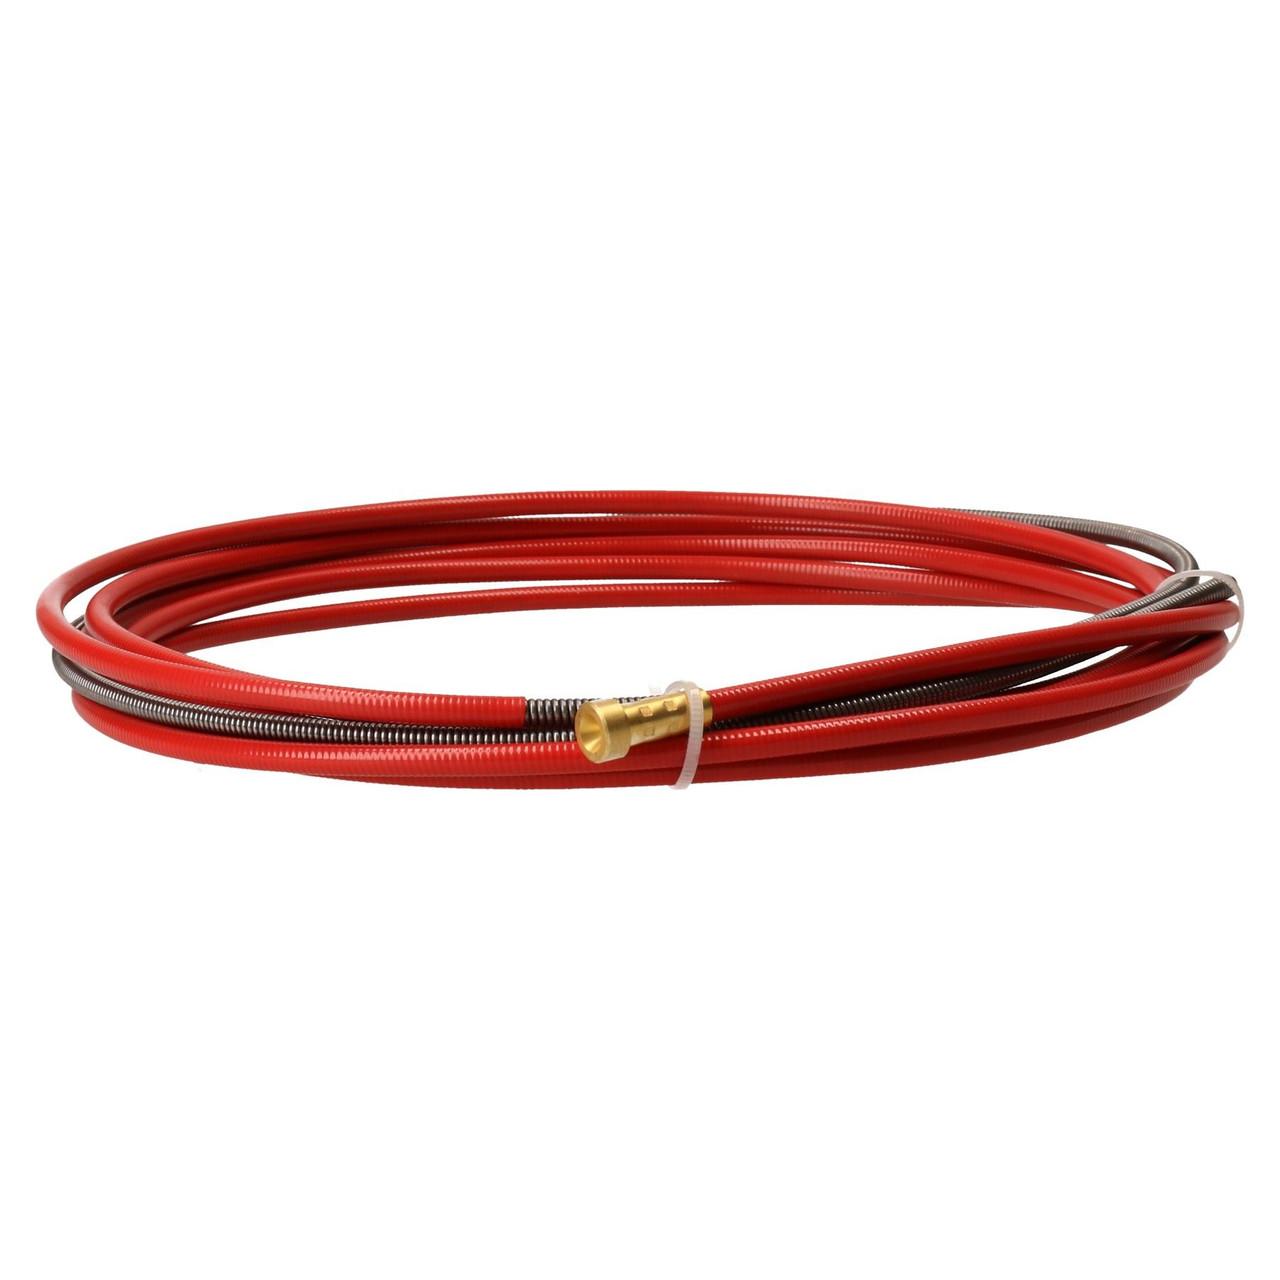 Liner Wire 0.6-0.9mm x 3M Welding Blue Steel Plastic Coated MIG Torch P.C